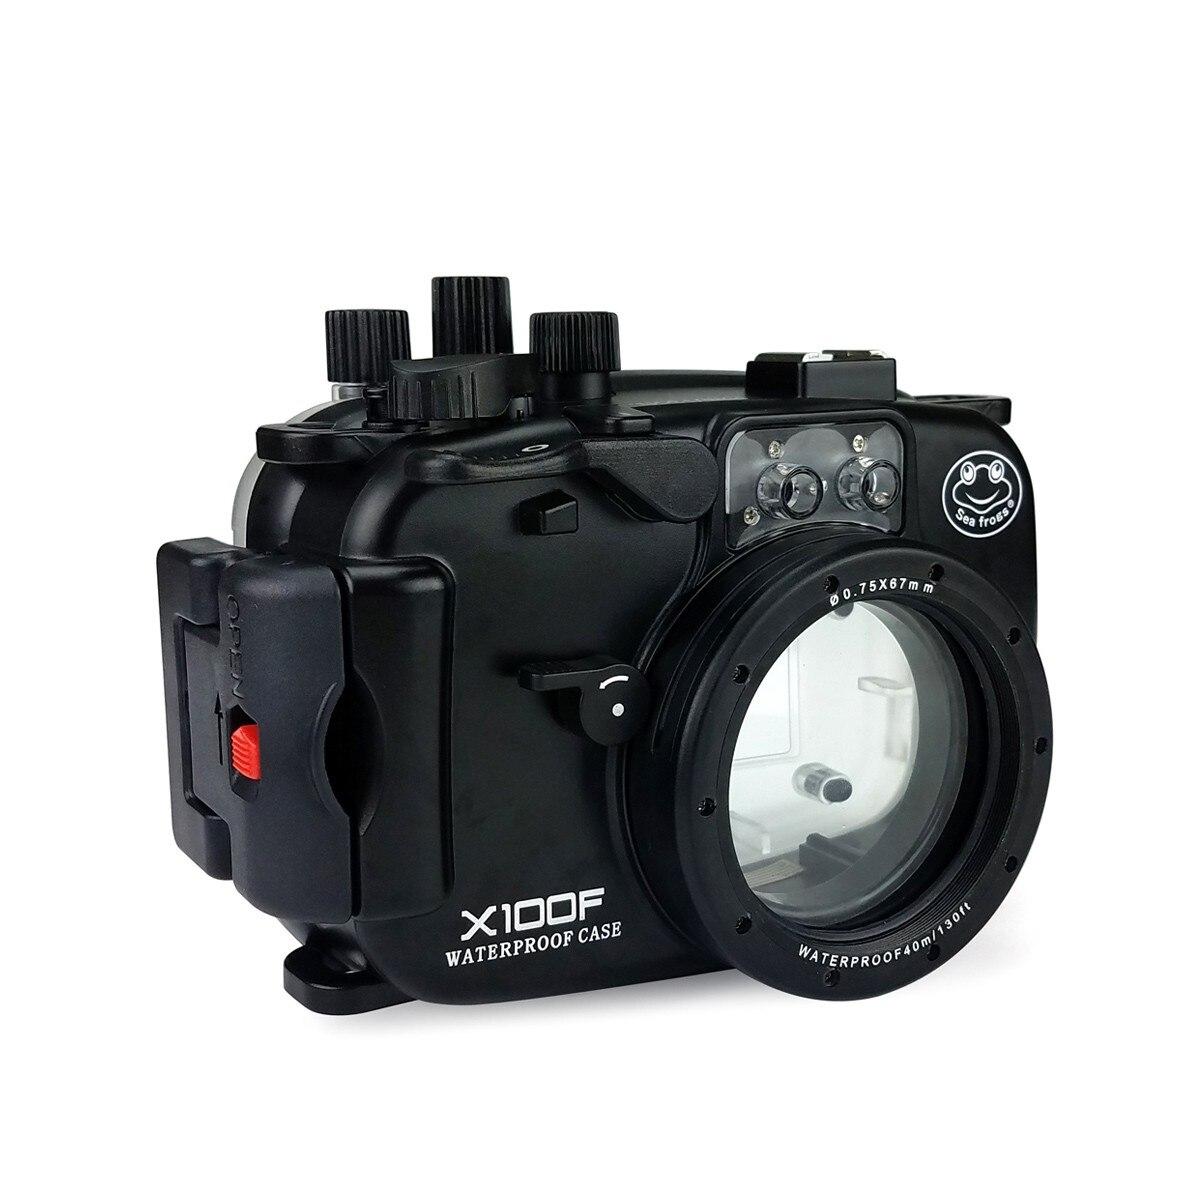 Seafrogs 40m/130ft Underwater Camera Housing Case For Fujifilm X100F Camera Waterproof Camera Bags for Fuji X100F meikon 40m wp dc44 waterproof underwater housing case 40m 130ft for canon g1x camera 18 as wp dc44